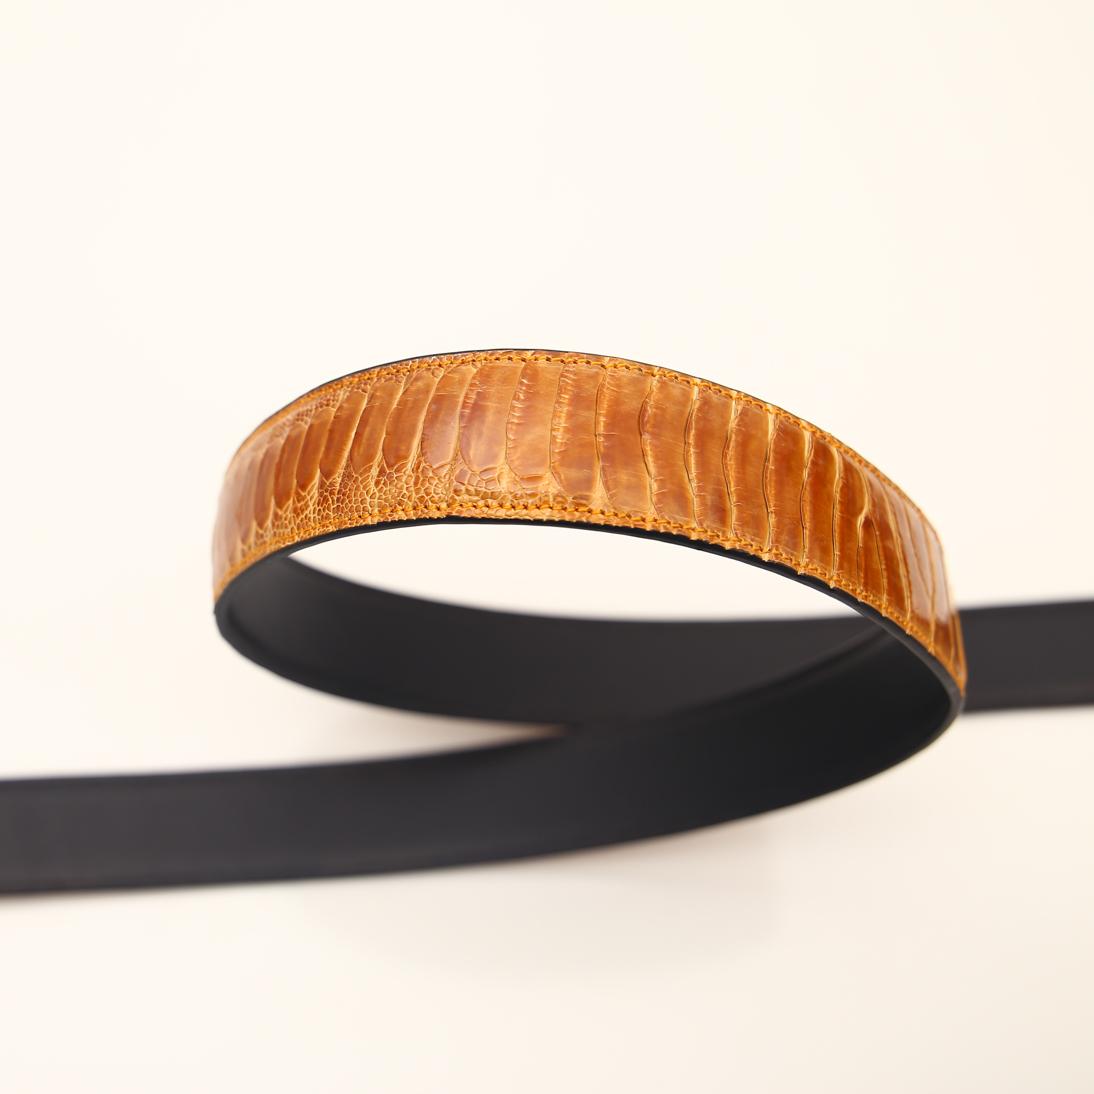 3 5 1595593990 Thắt lưng nam FTT leather